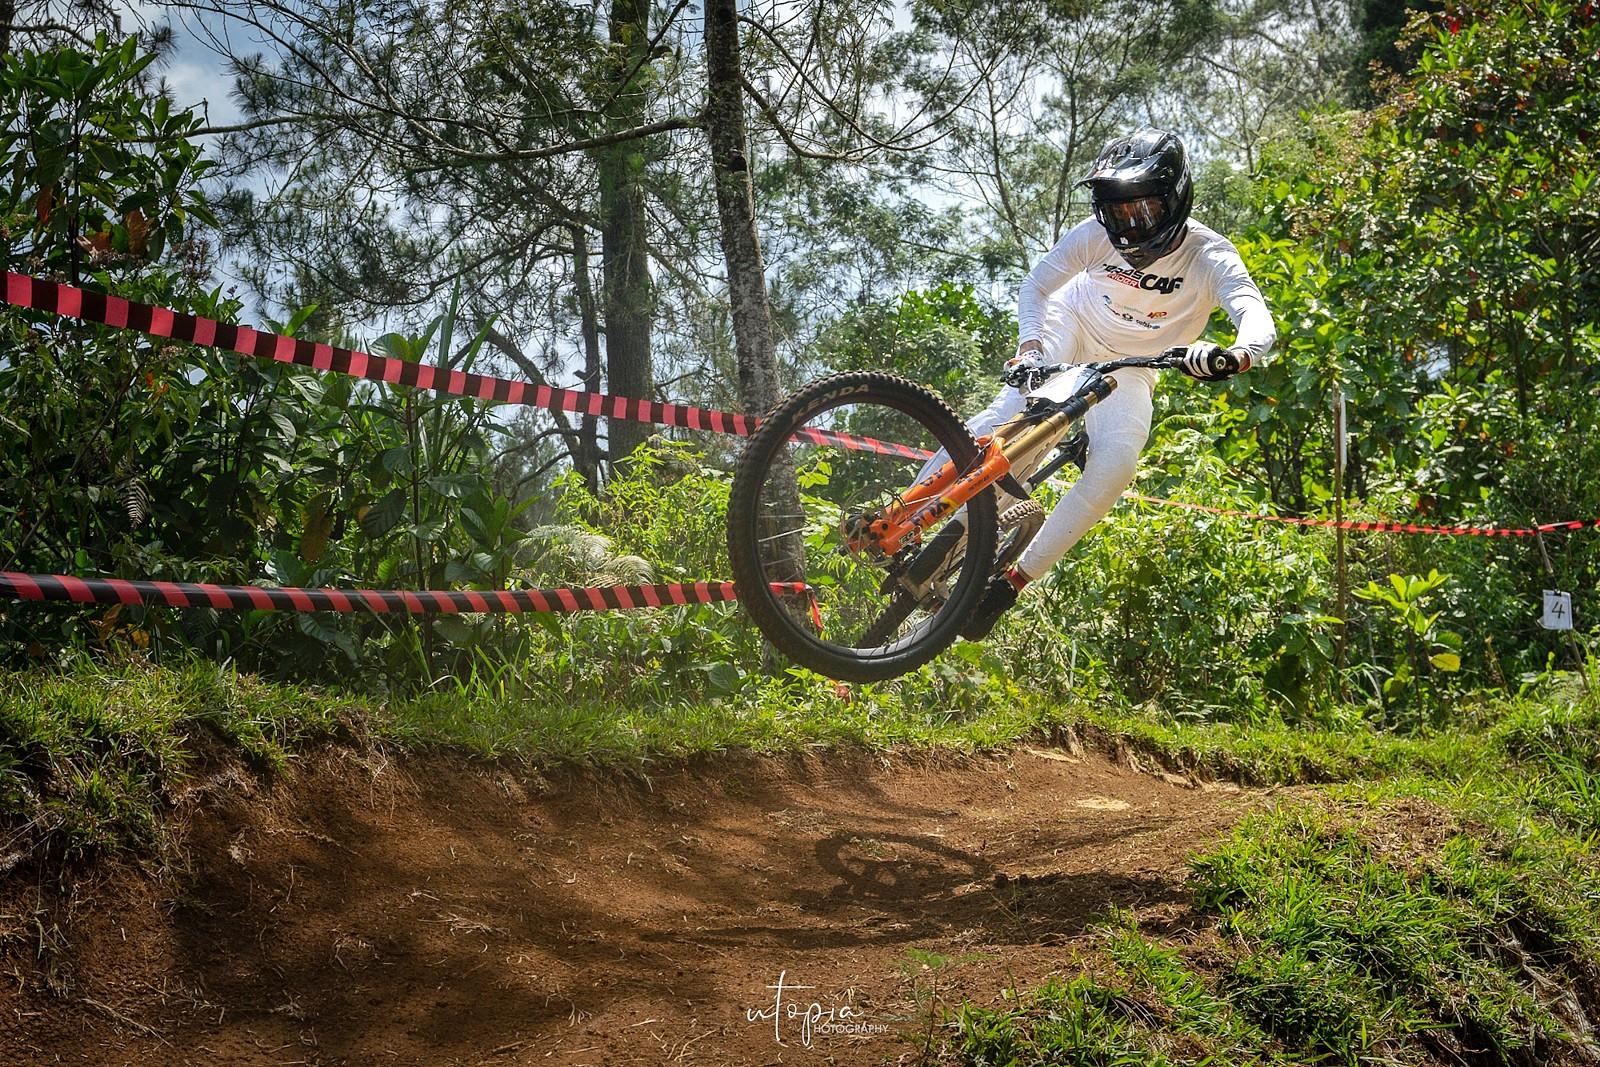 Sideways - utopiaarch - Mountain Biking Pictures - Vital MTB